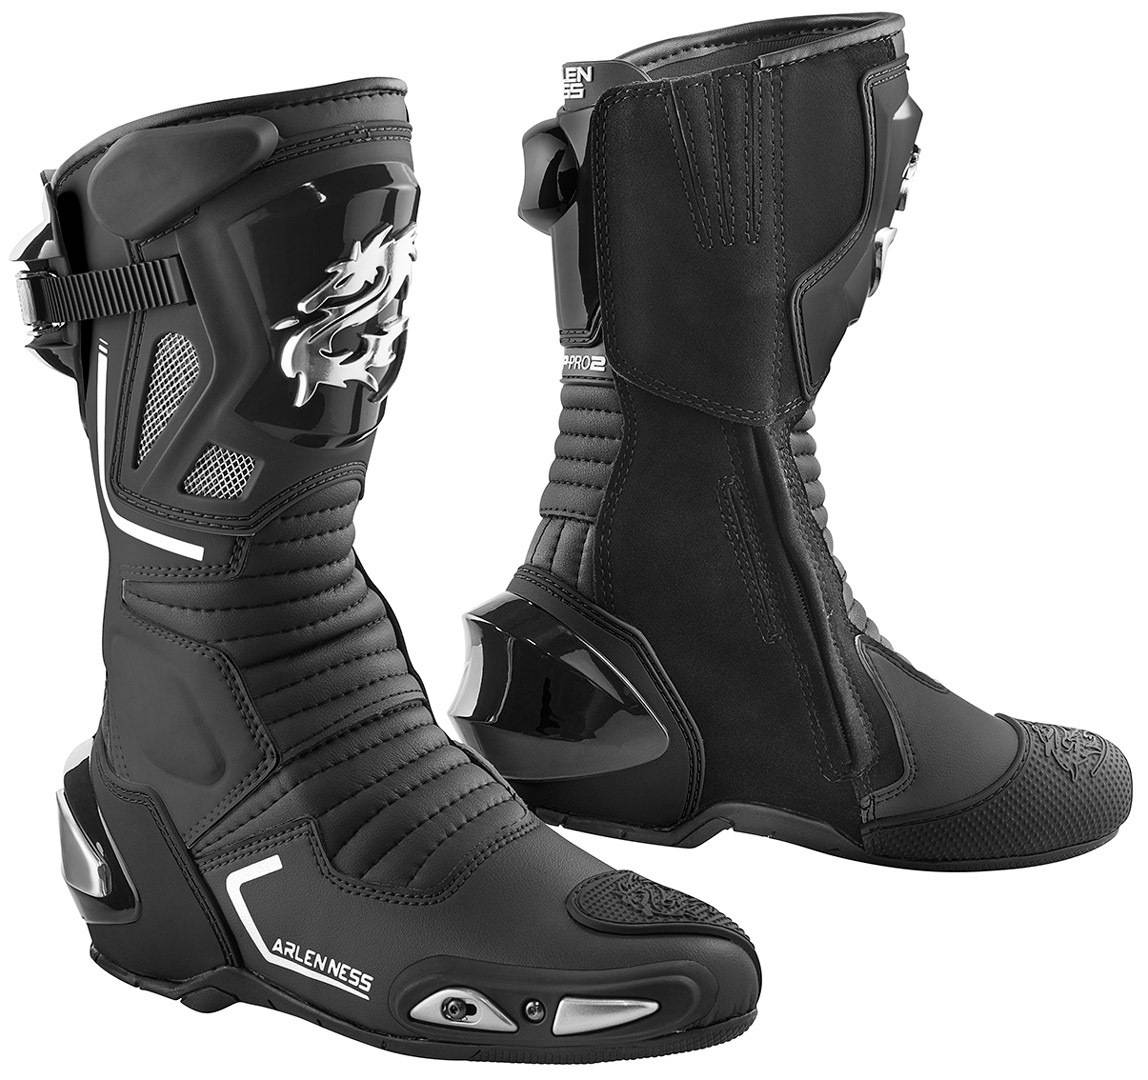 Arlen Ness Sugello Bottes de moto Noir taille : 38